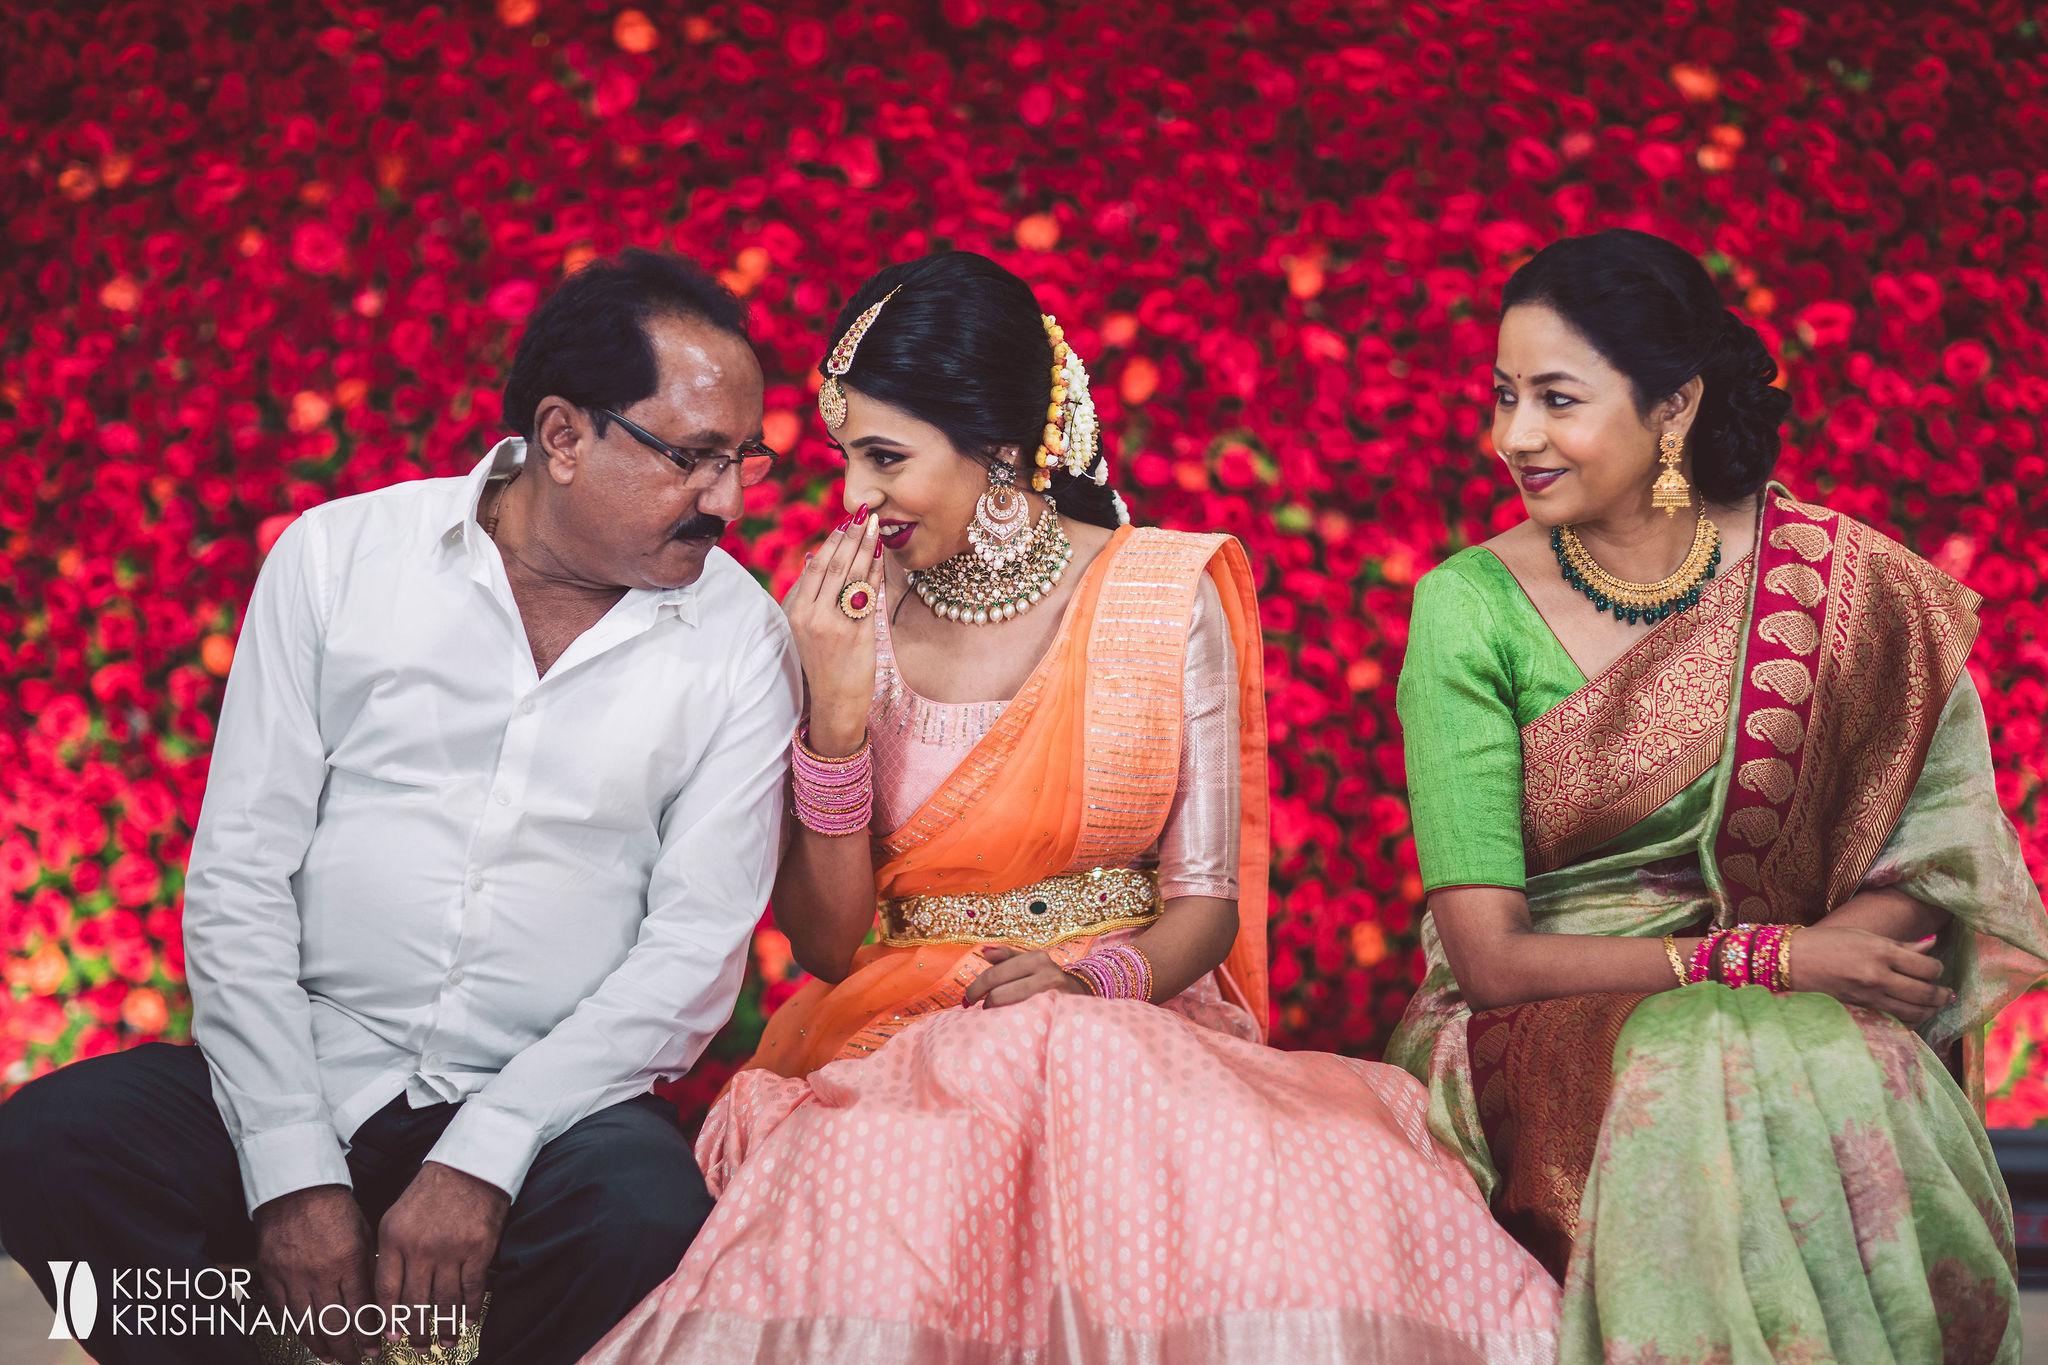 fun-moments-fab-day-bridal-moments-candids-wedding-time-kishorkrishnamoorthi-warangal